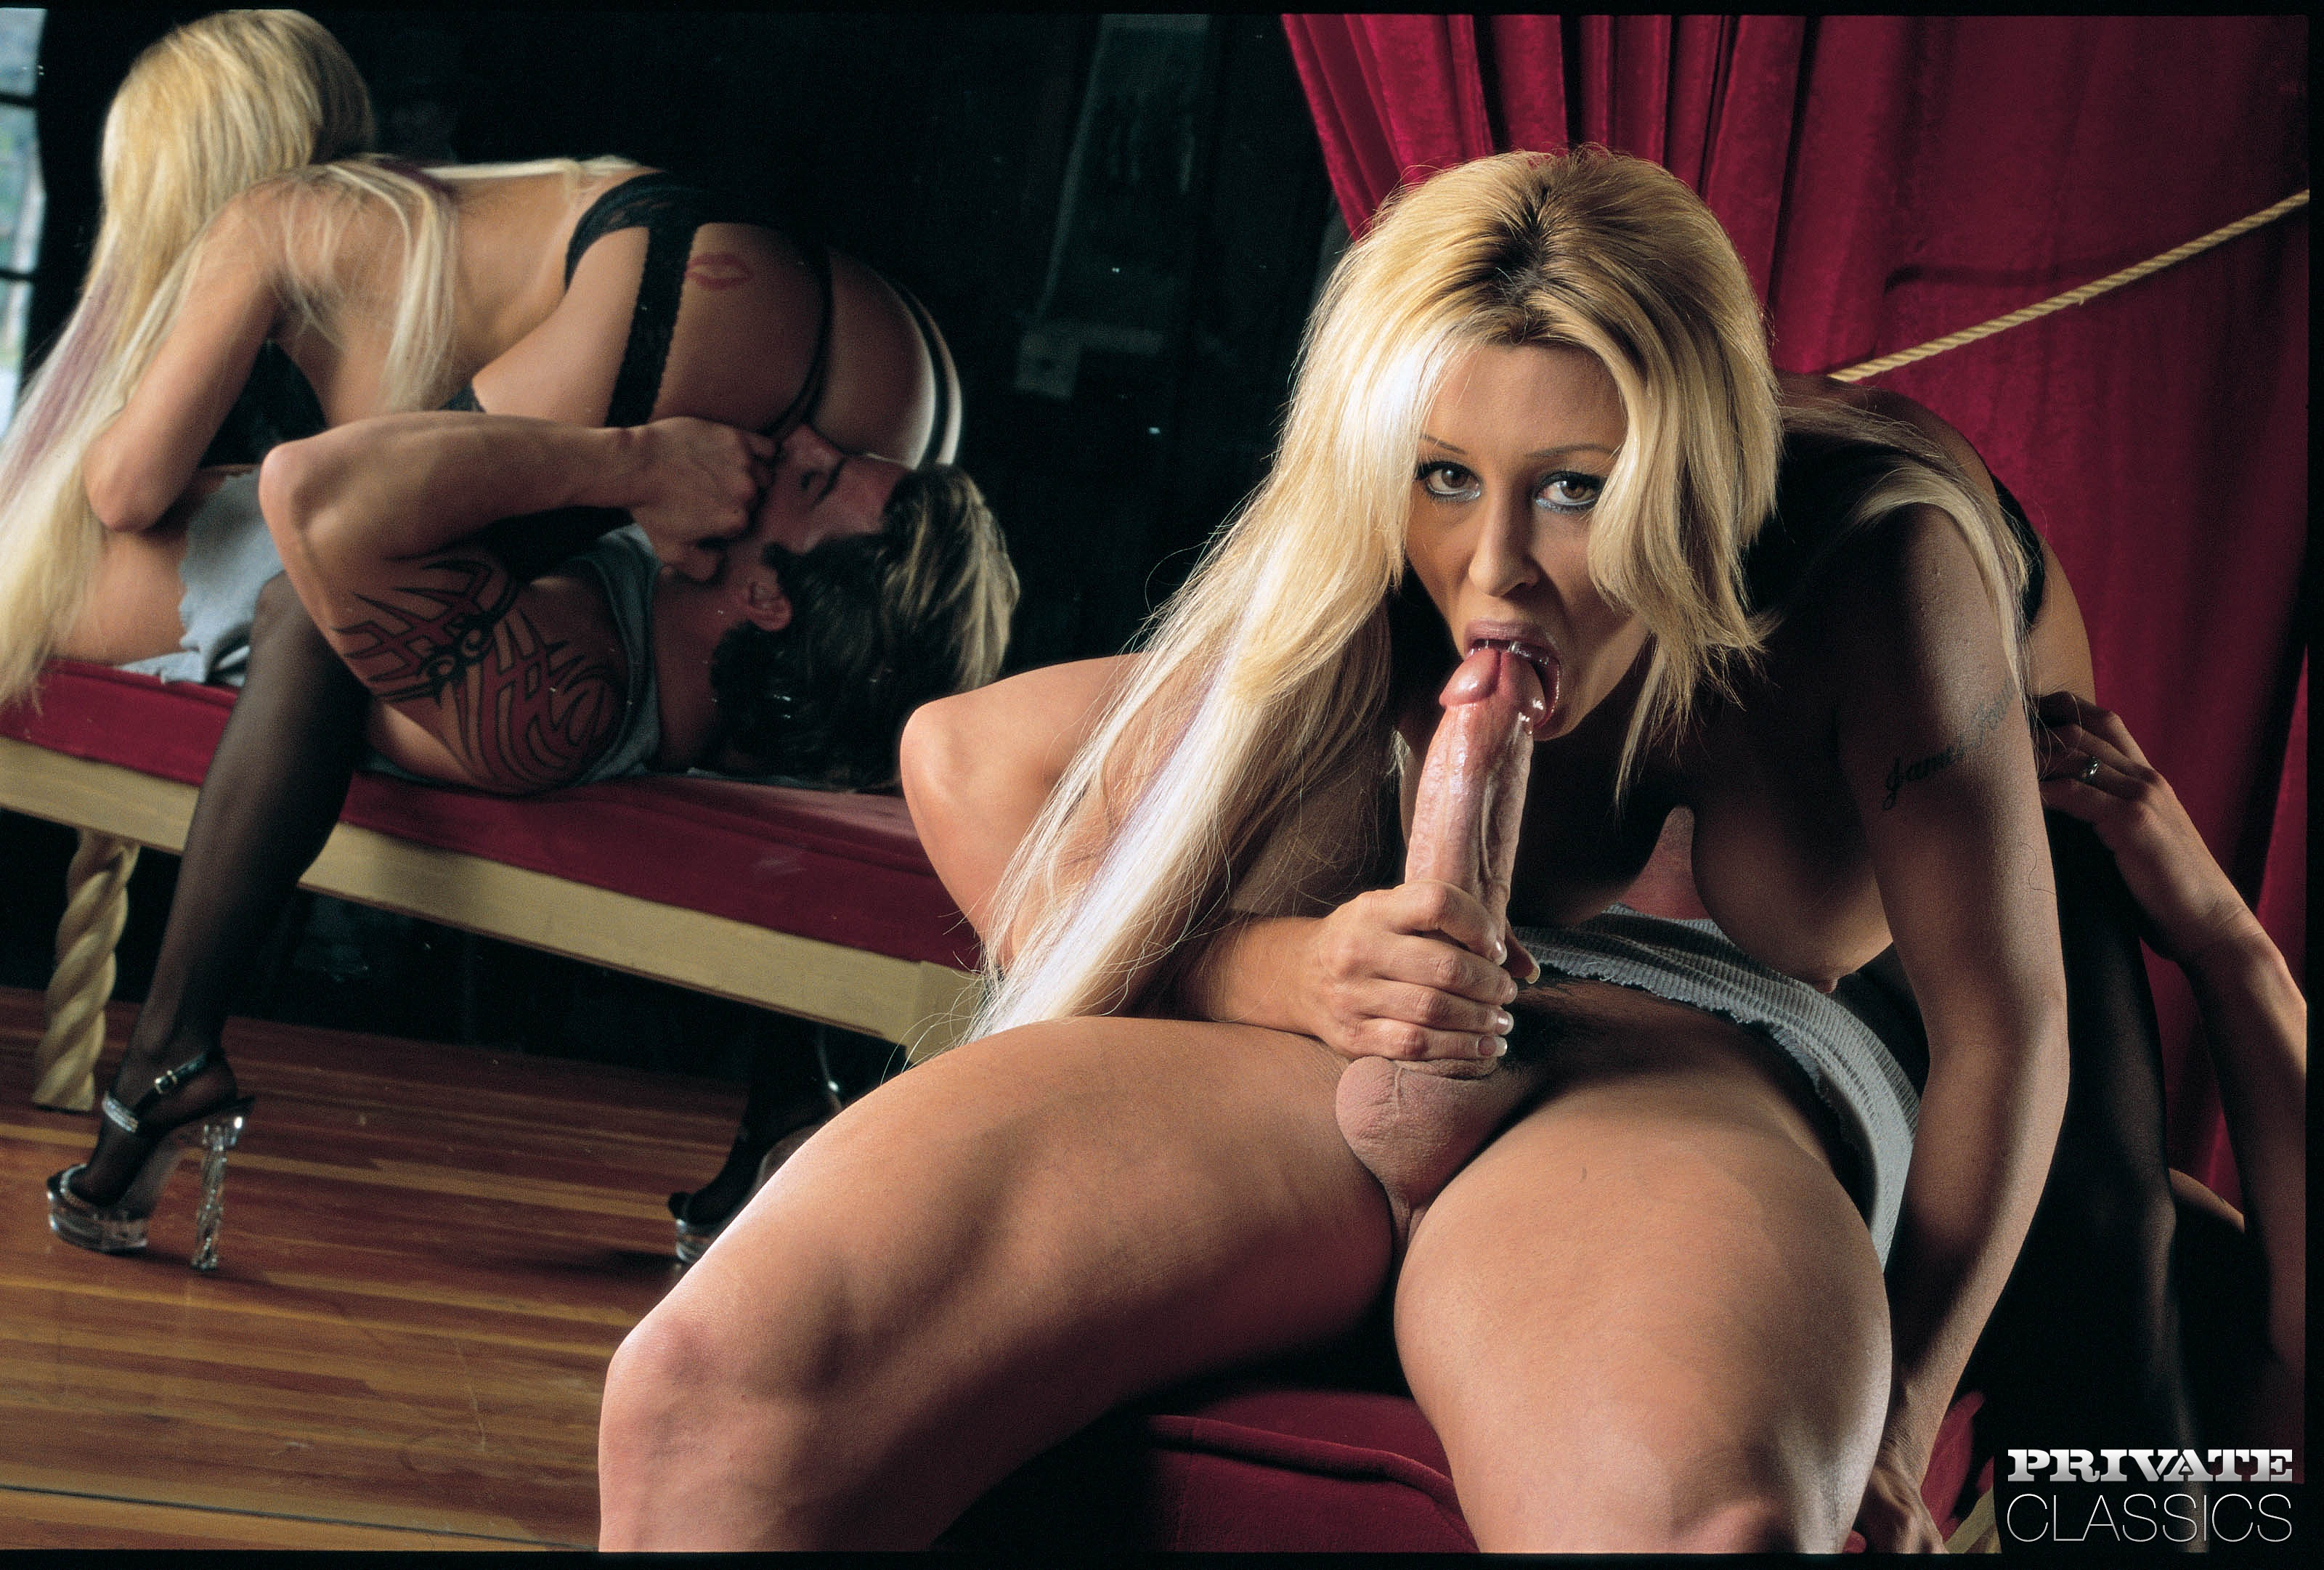 Jill valintine nude pics naked scenes